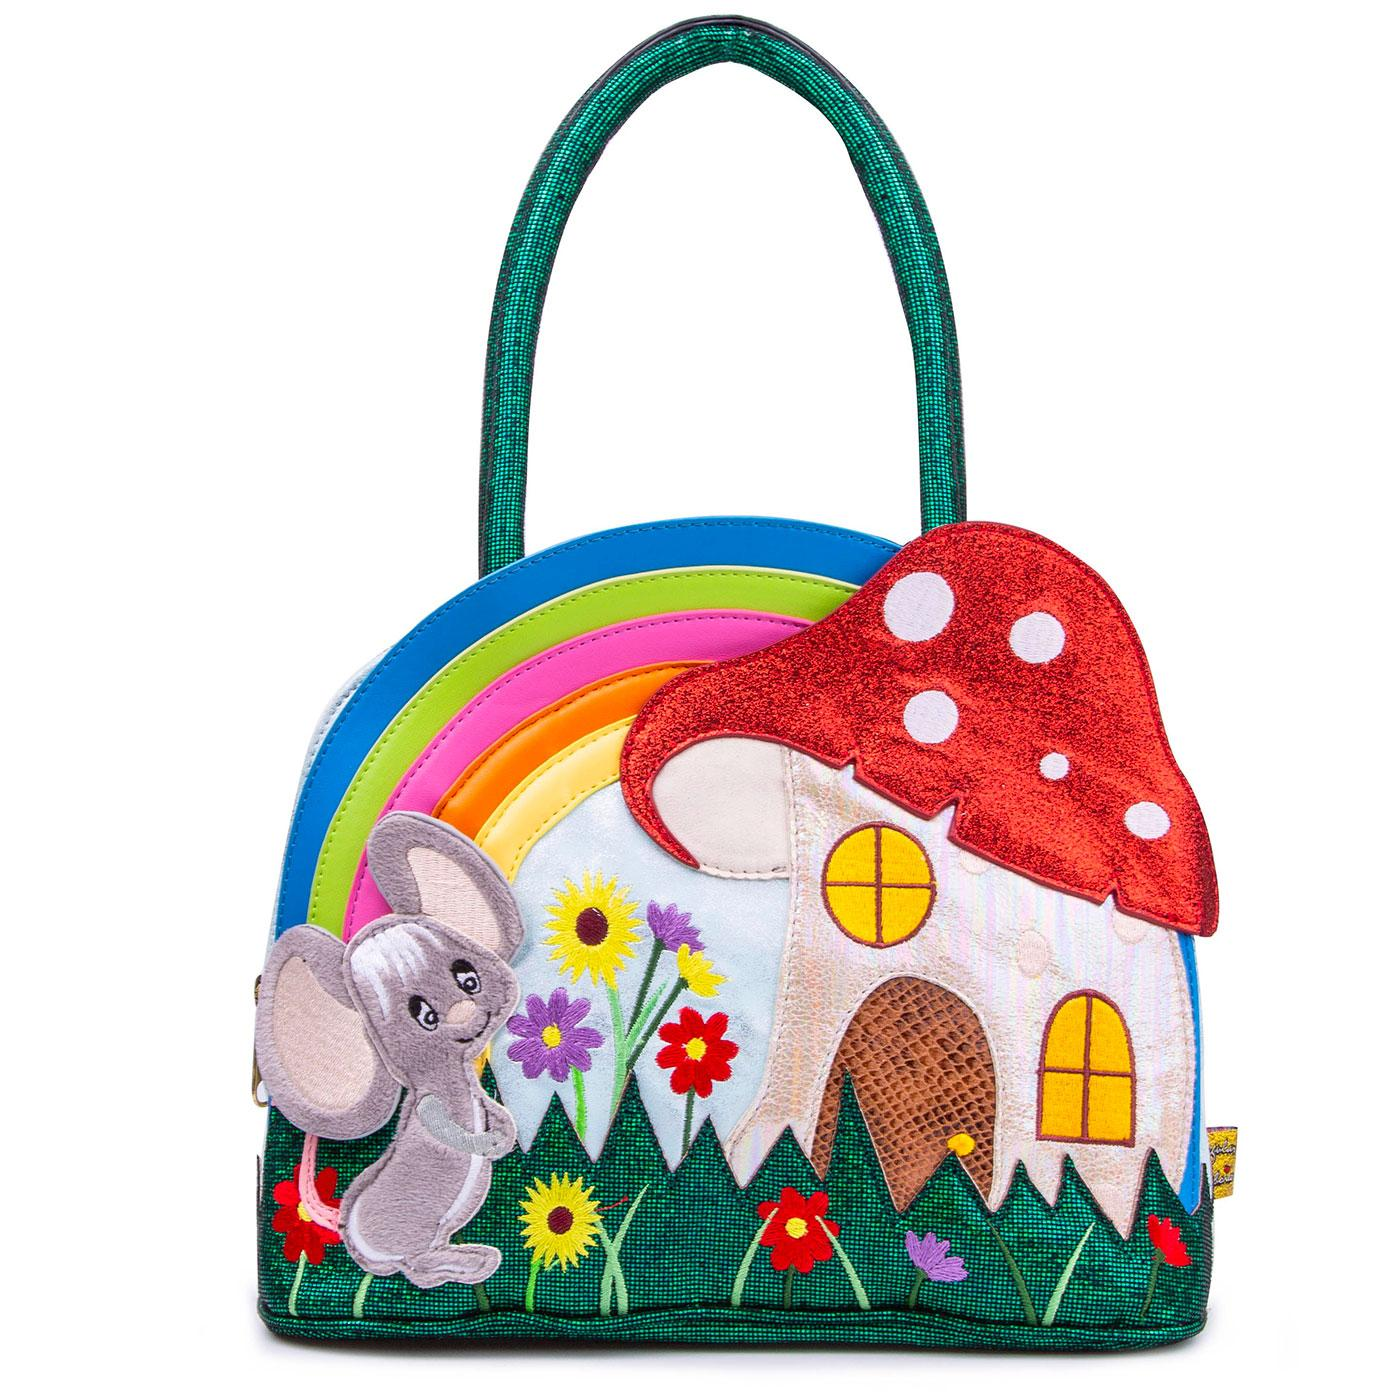 Toplino IRREGULAR CHOICE Retro Mouse Shoulder Bag